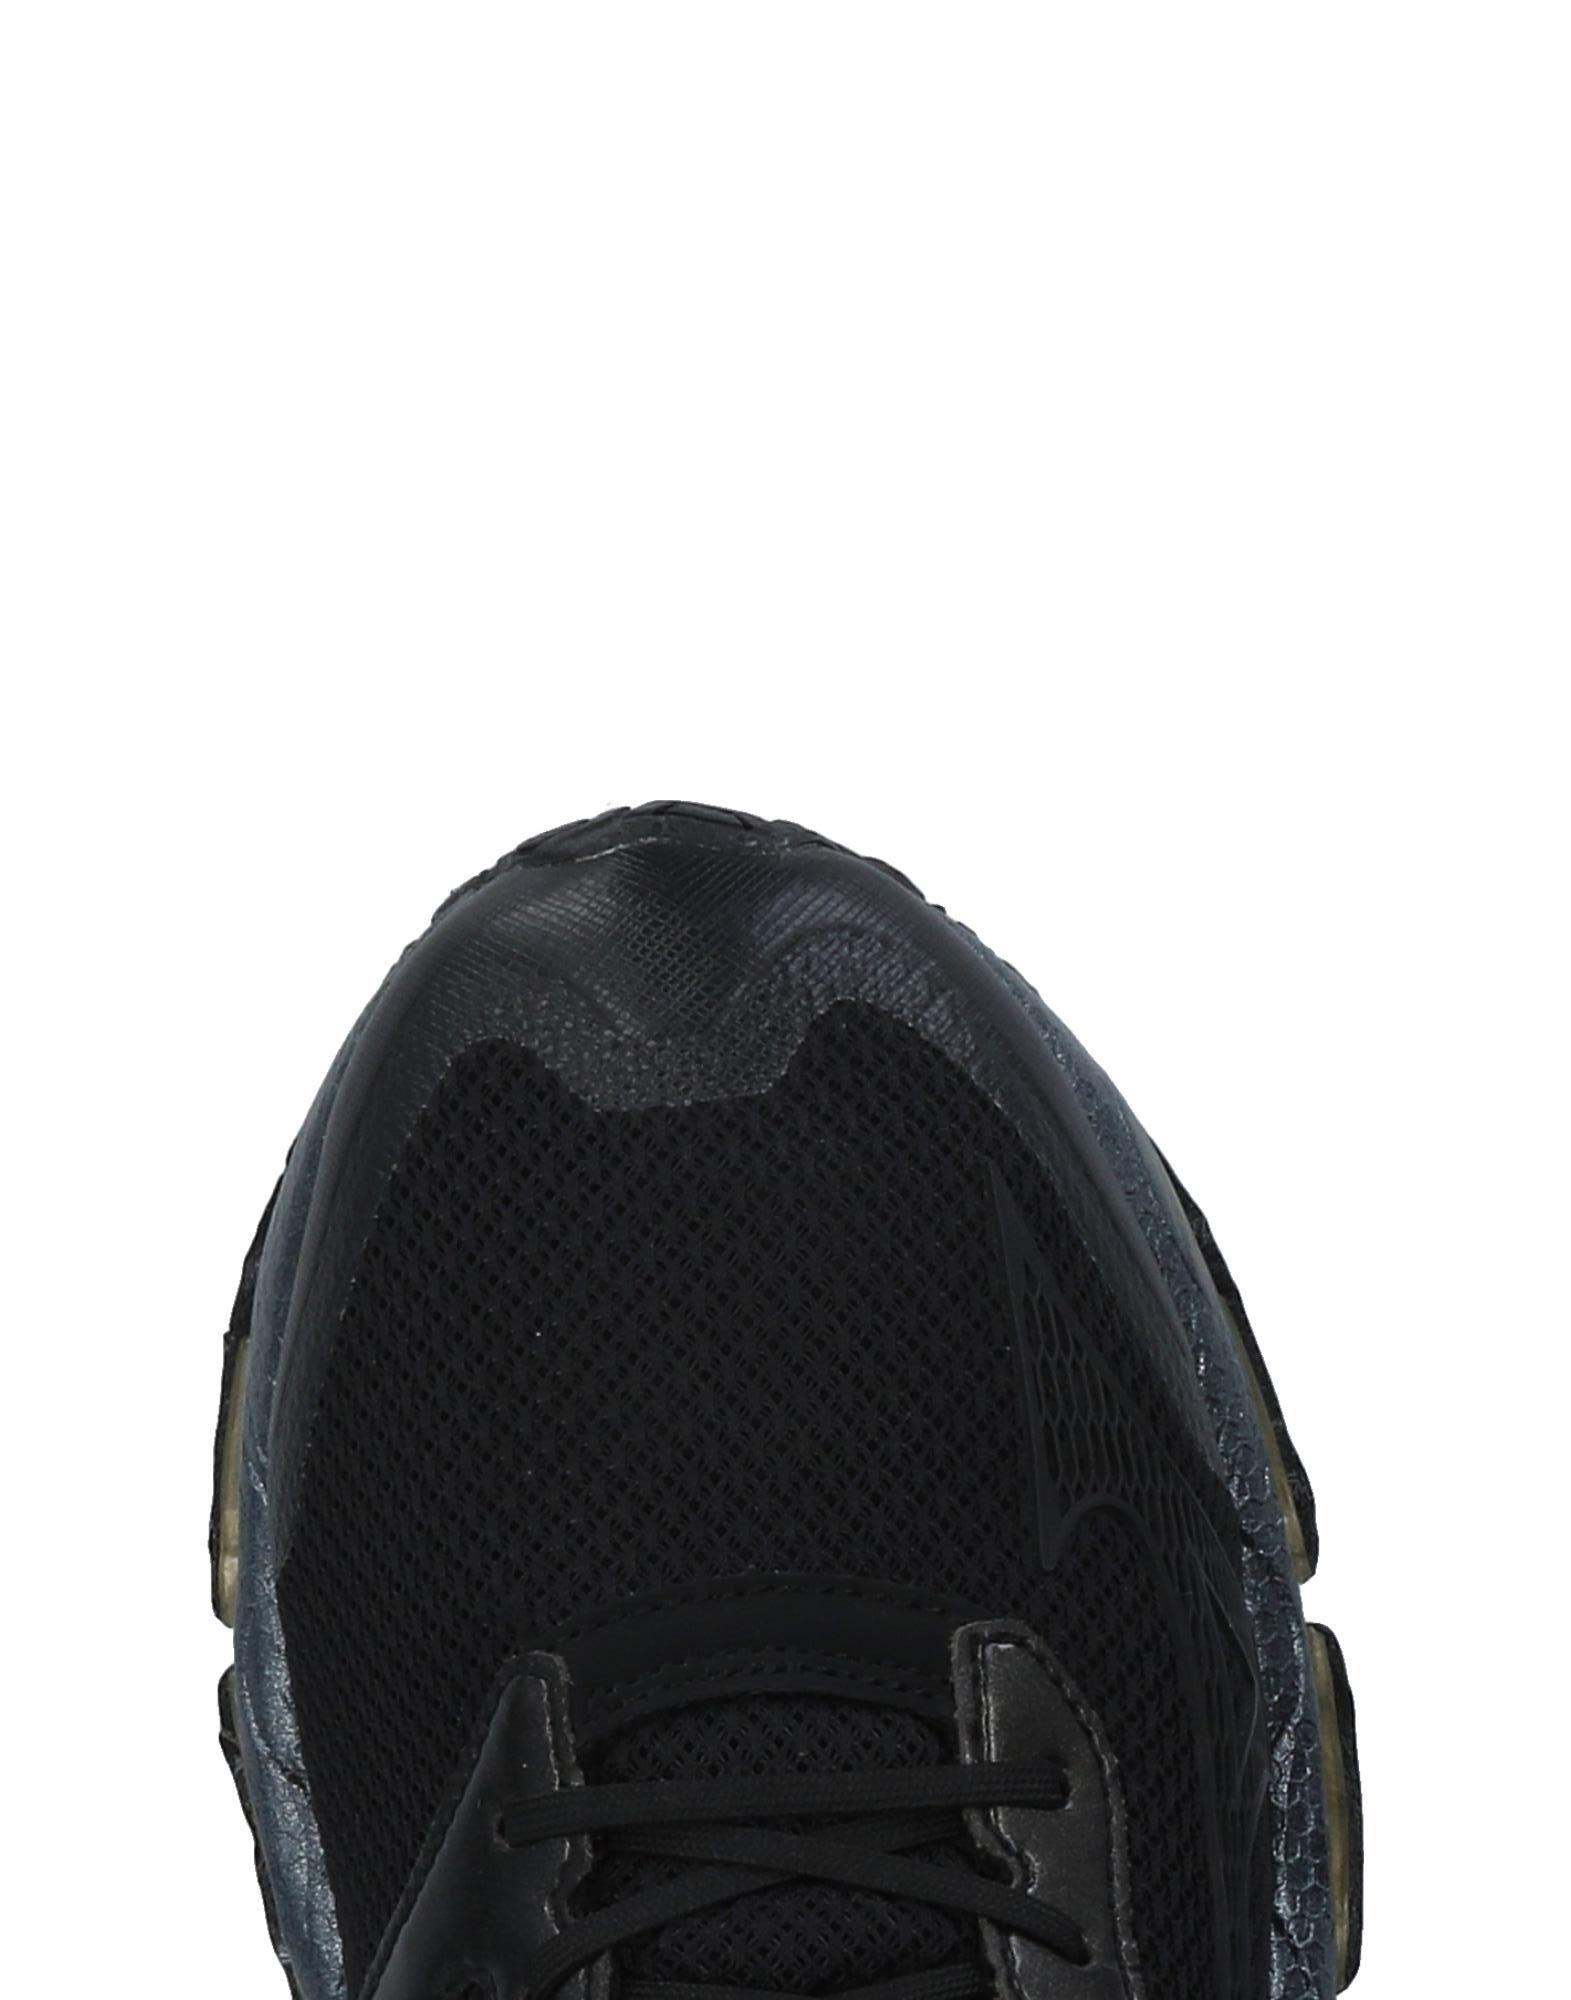 A buon mercato Sneakers Mizuno Uomo - 11495209AG